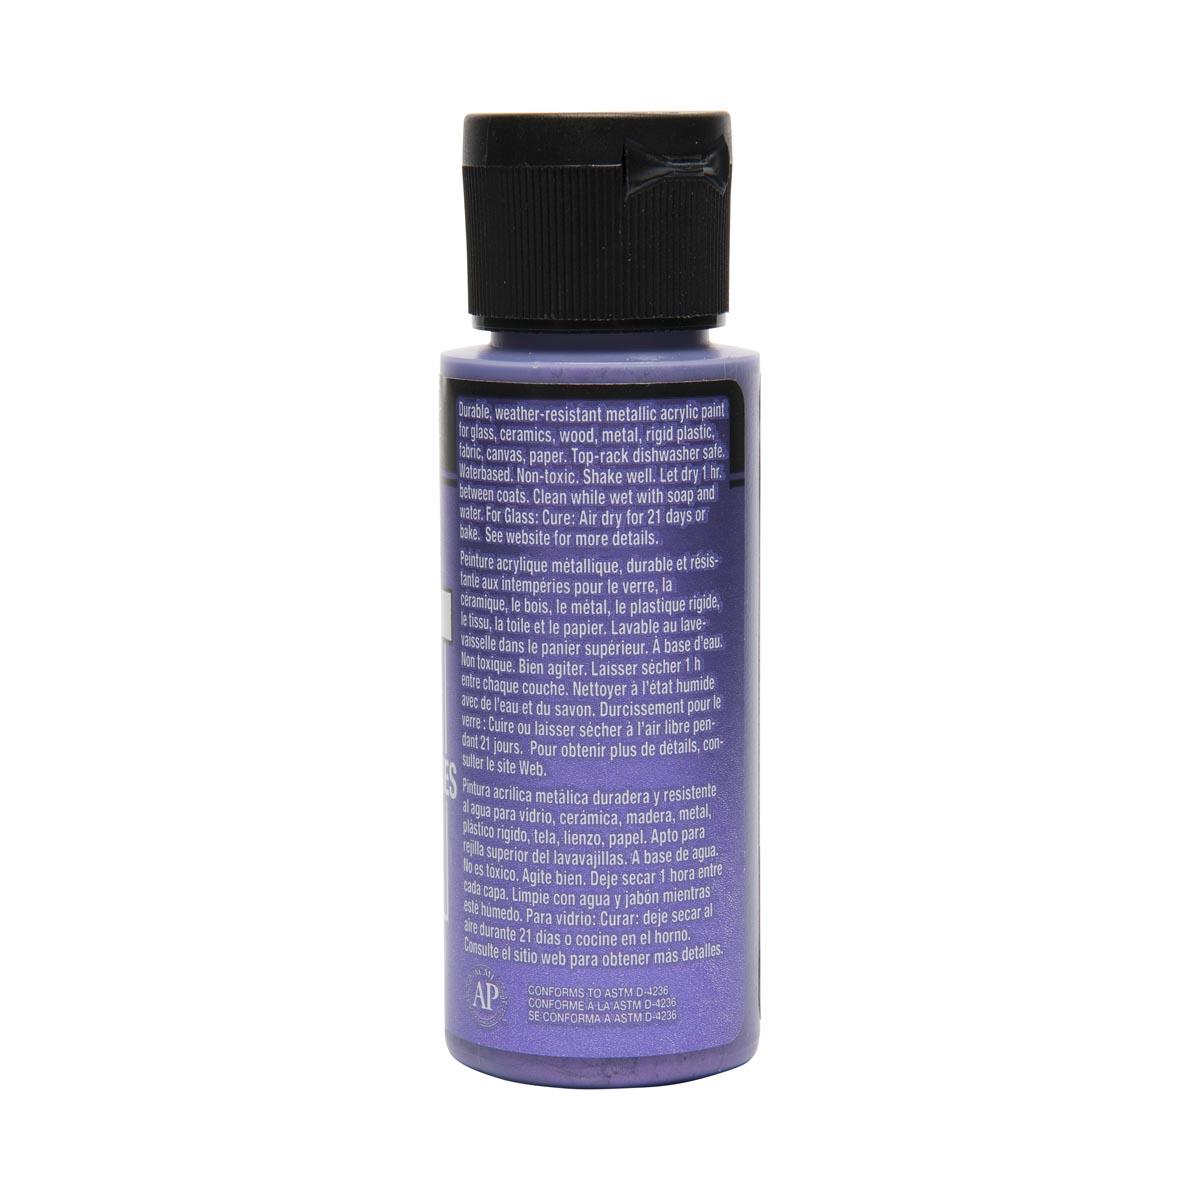 FolkArt ® Multi-Surface Metallic Acrylic Paints - Tanzanite, 2 oz. - 6313